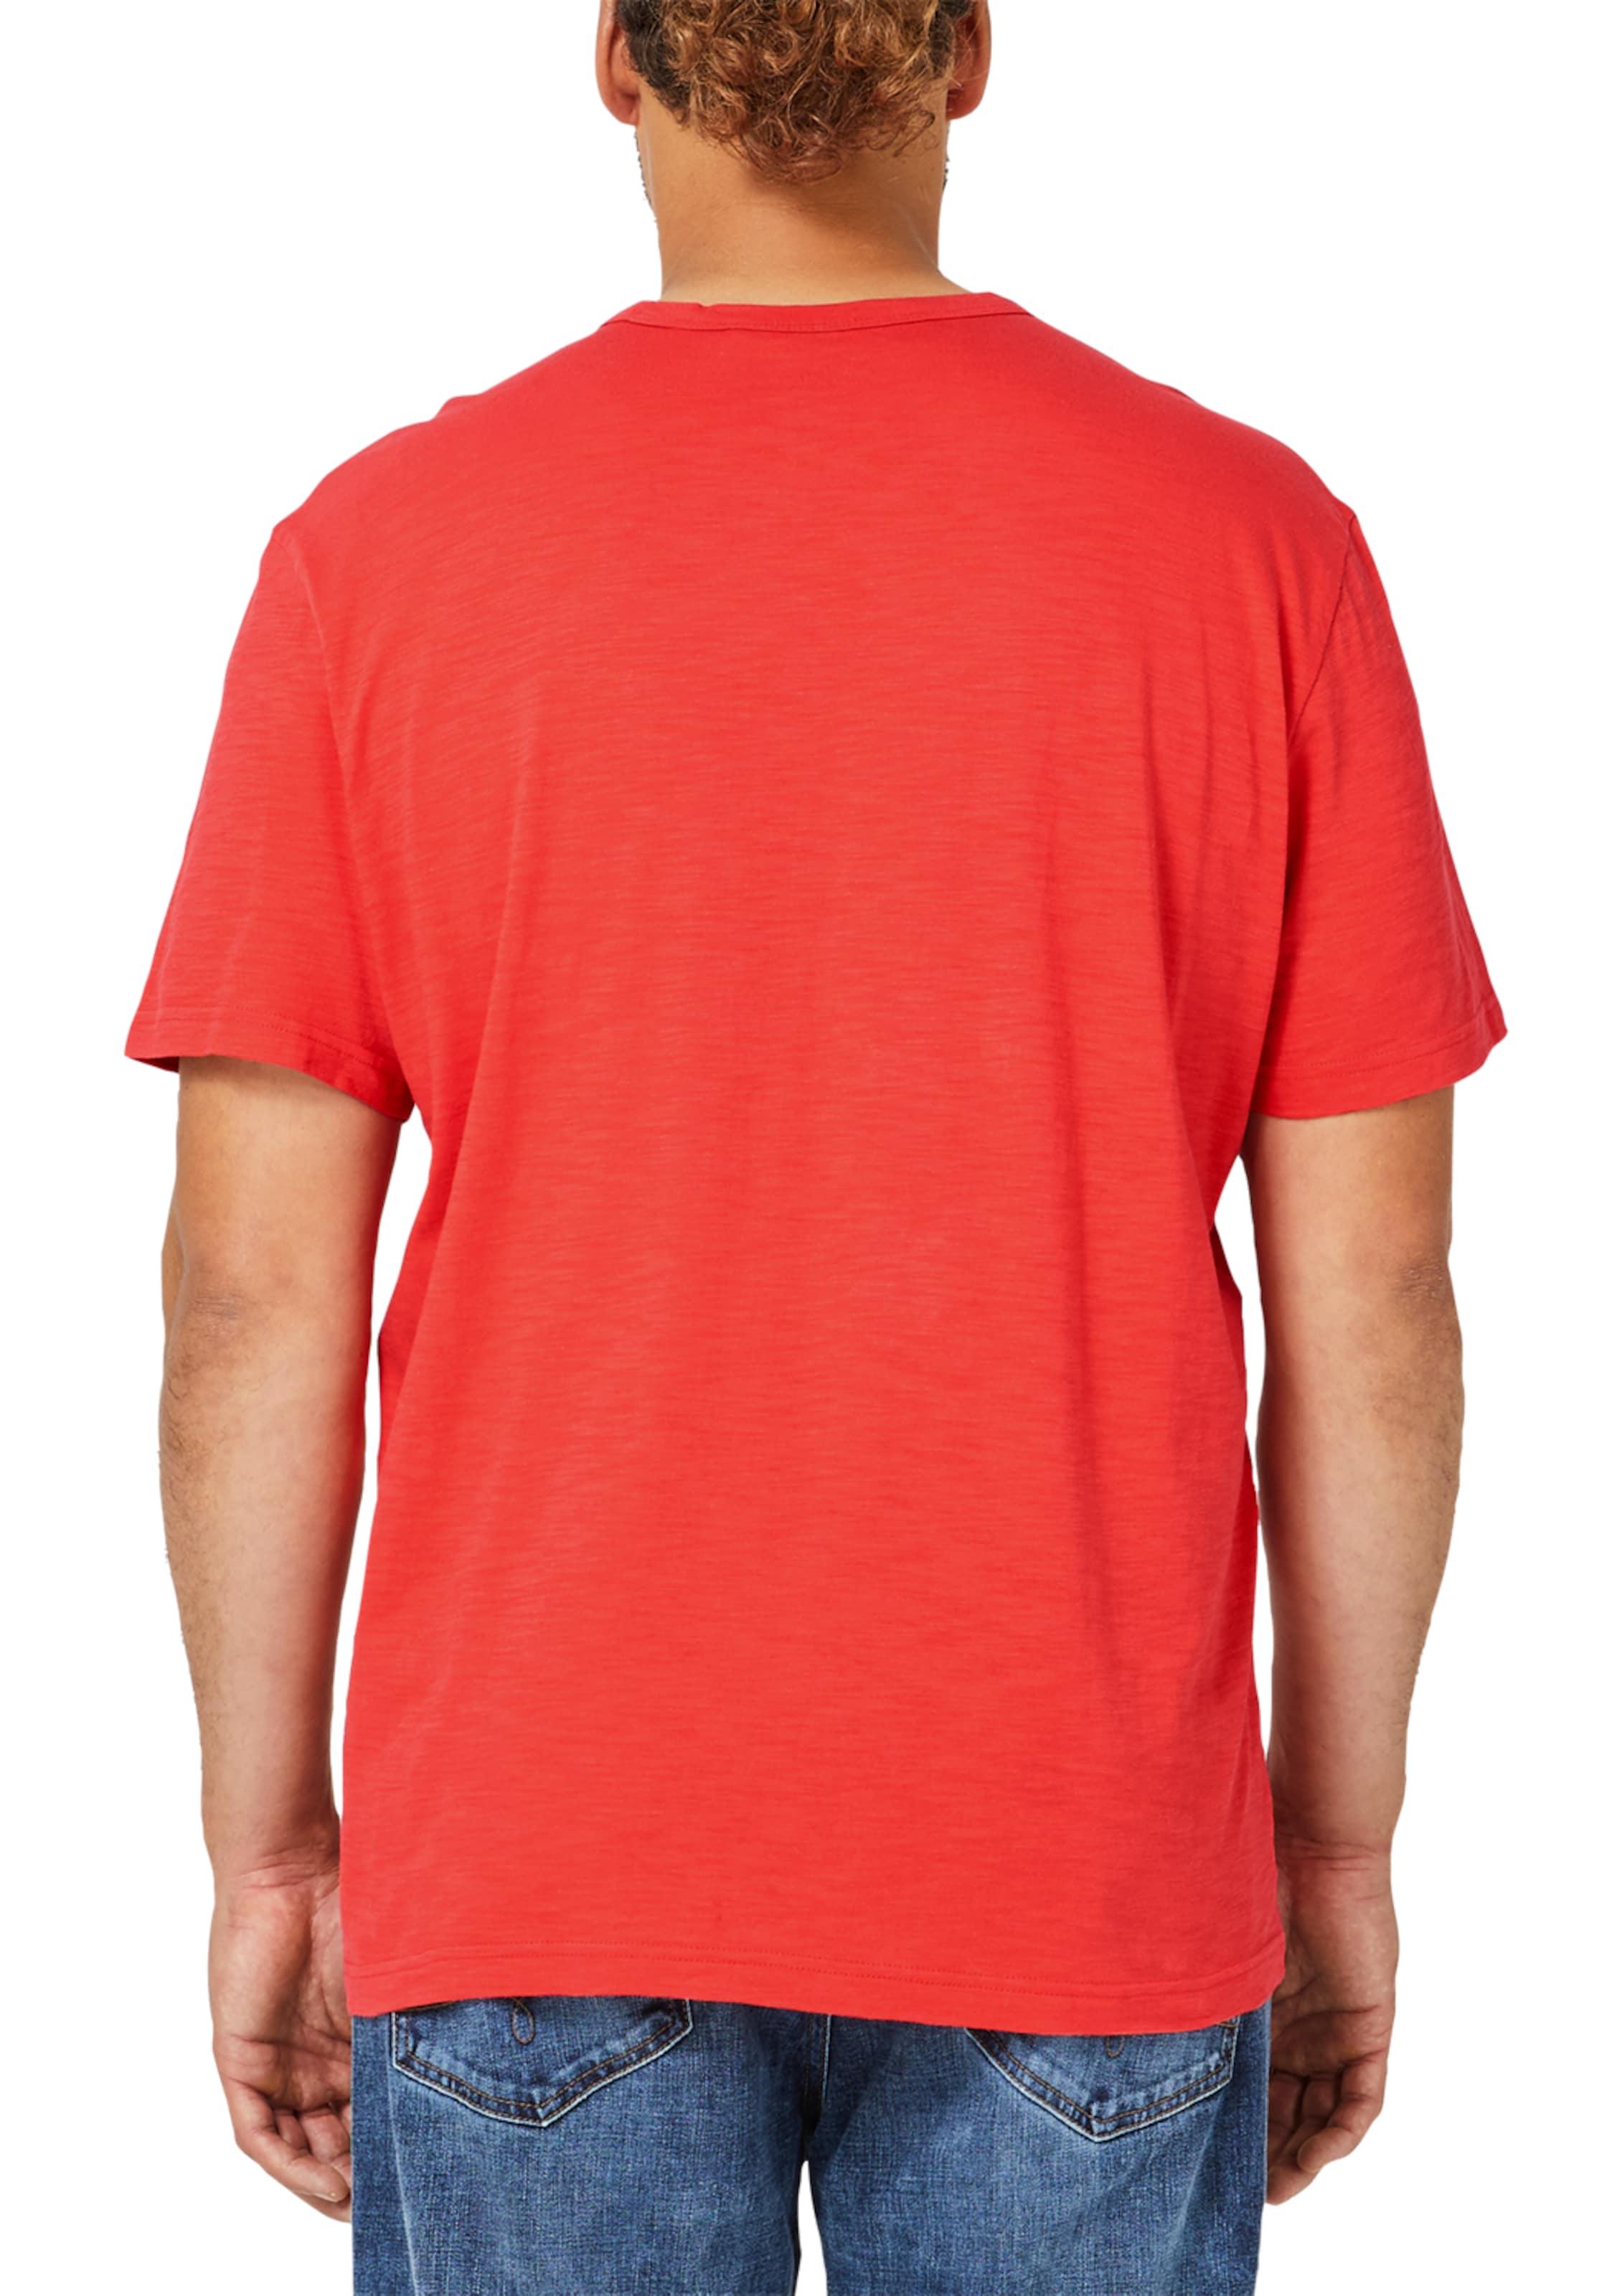 In Weiß S T oliver shirt Schwarz NavyGrenadine Ig76Yymbfv